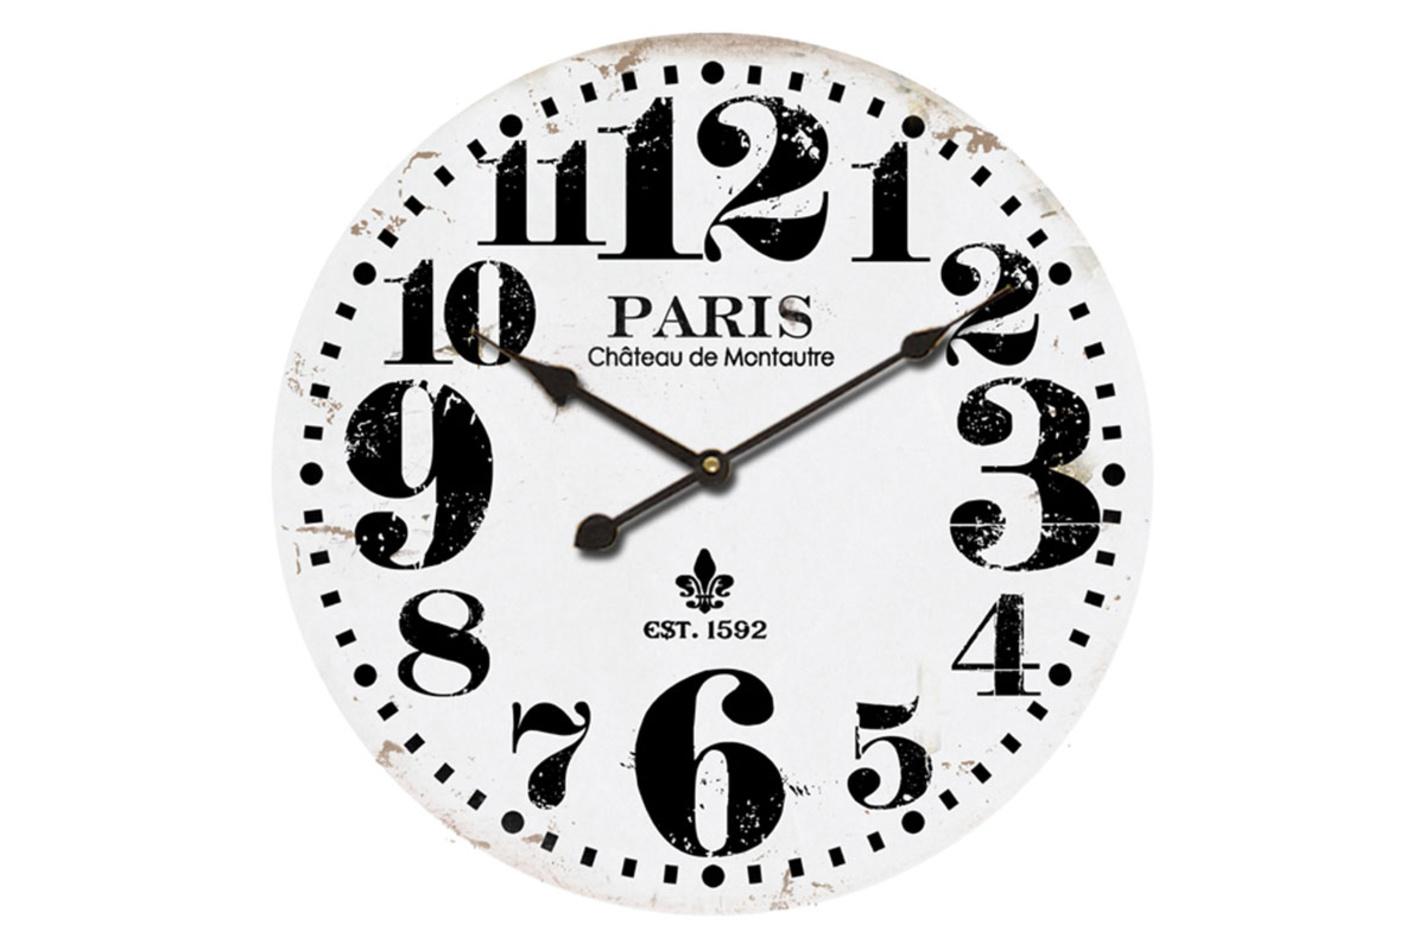 Autronic Nástenné hodiny Paris pr. 58 cm, HA712174